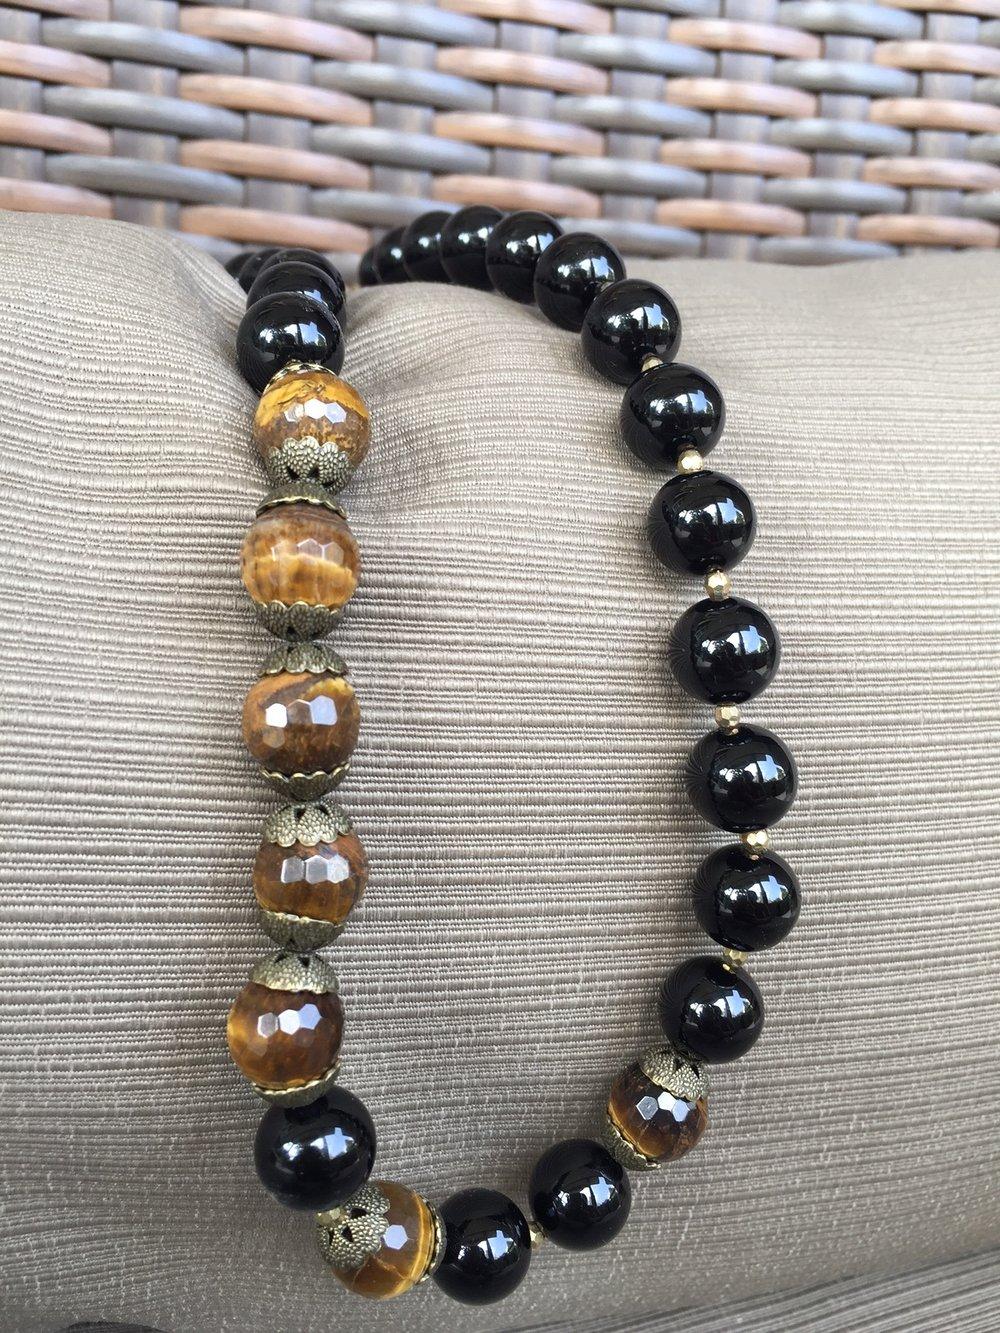 Black agate + Tiger eye necklace_2.JPG